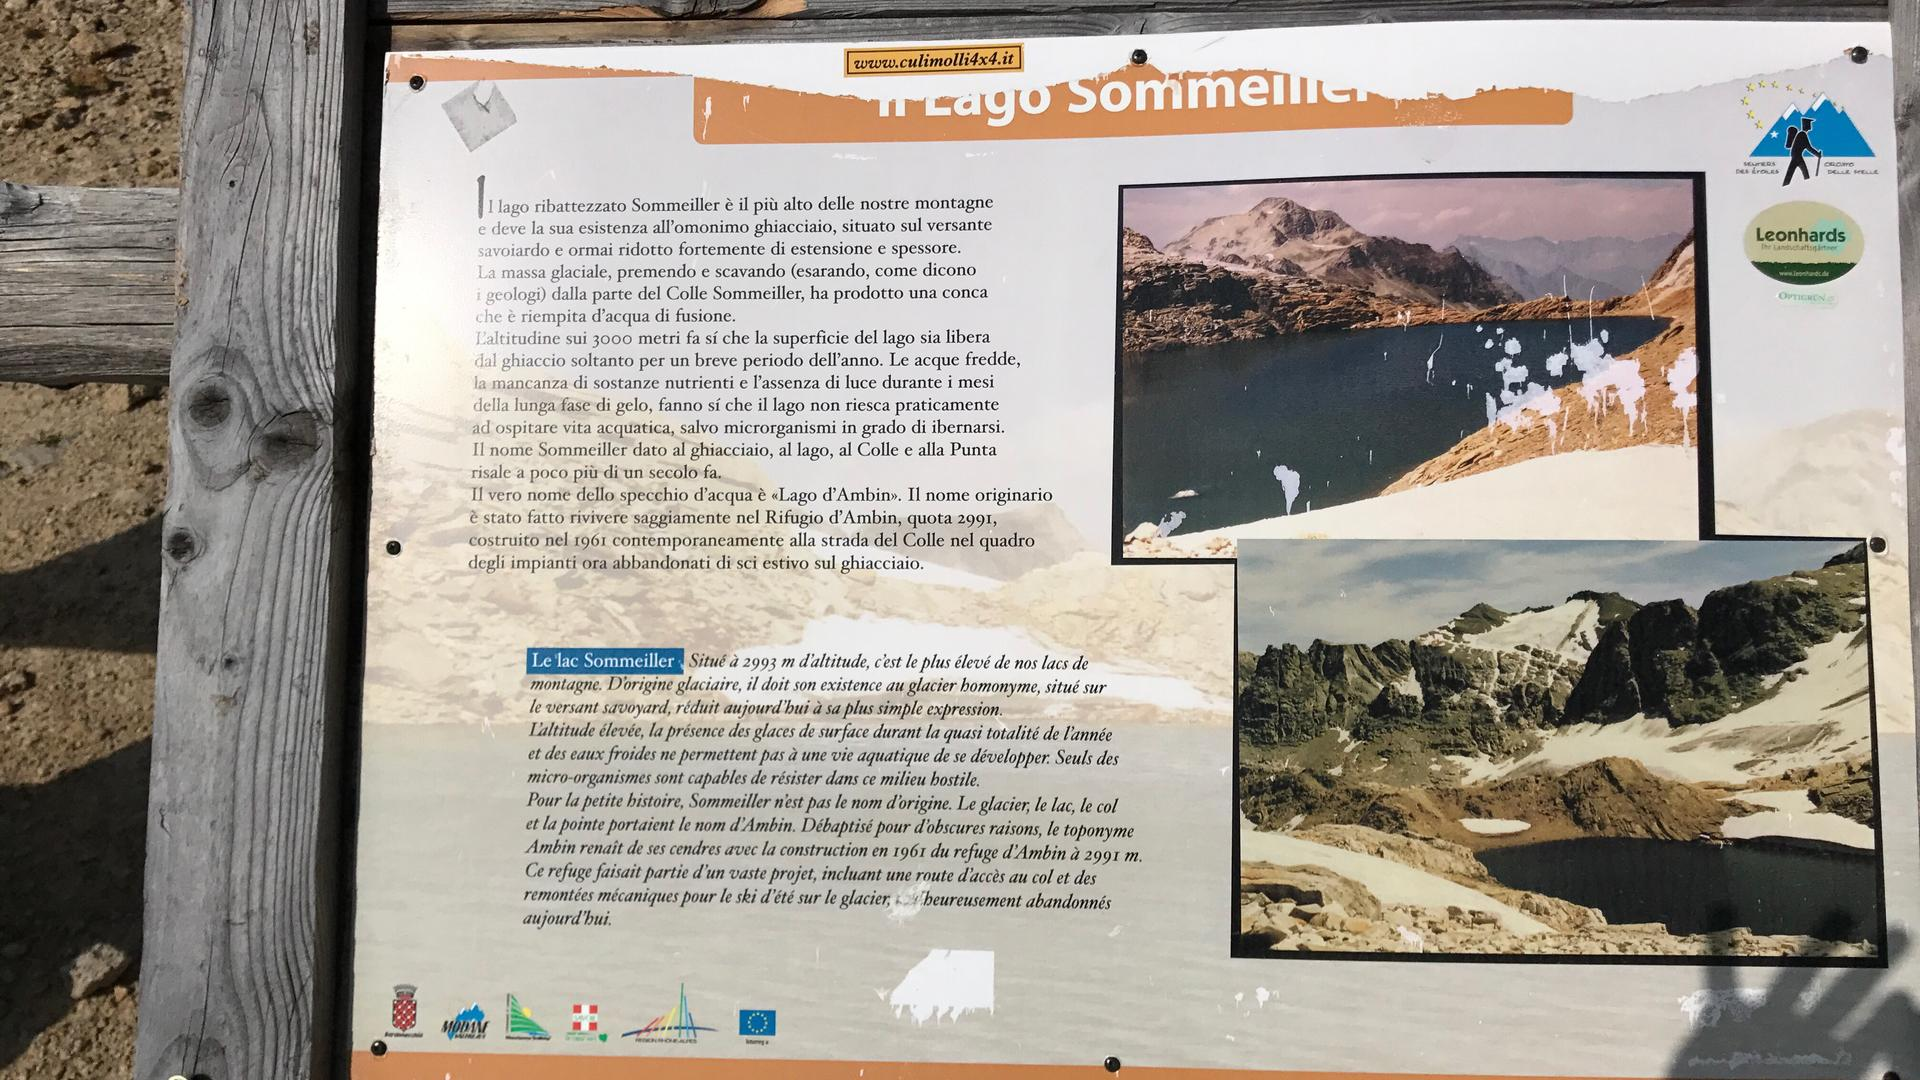 Höchster mit KfZ (legal) befahrbarer Punkt in Europa: Sommeiller Pass, 2.995 m